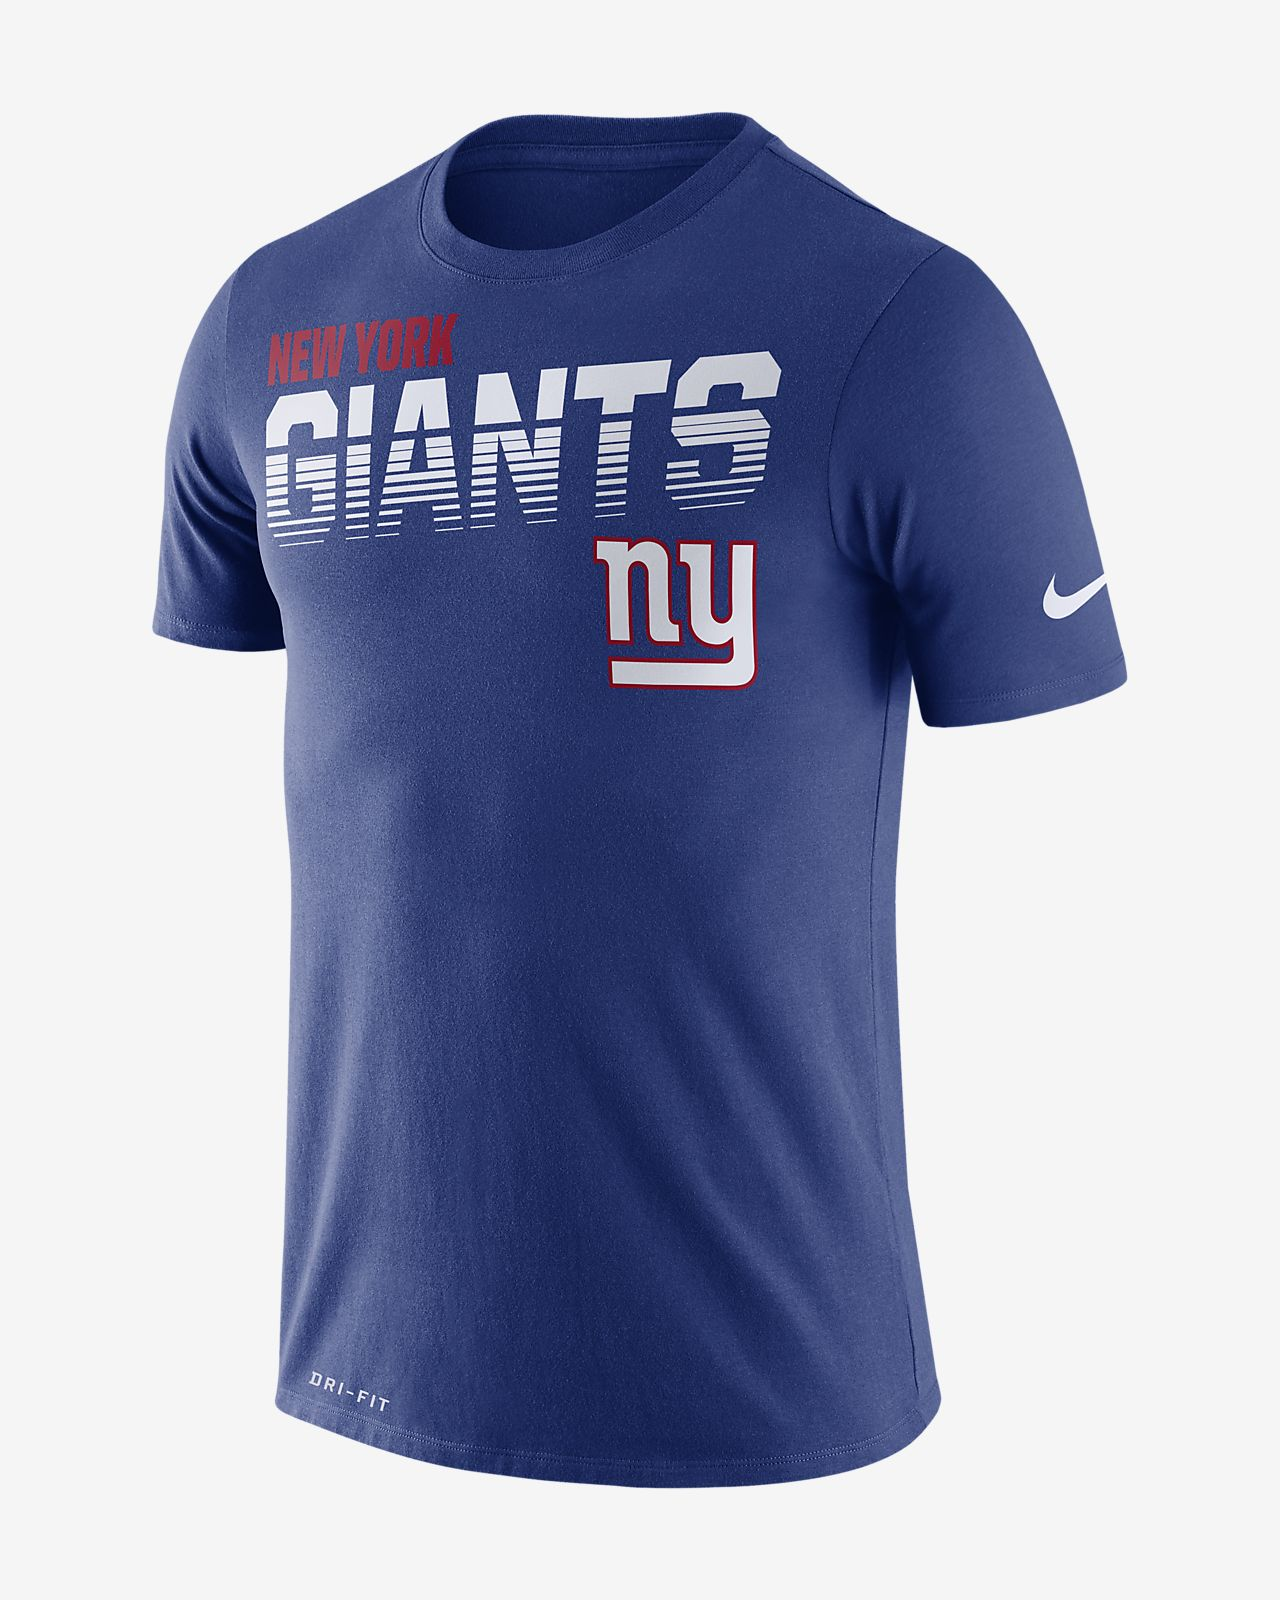 Мужская футболка с длинным рукавом Nike Legend (NFL Giants)